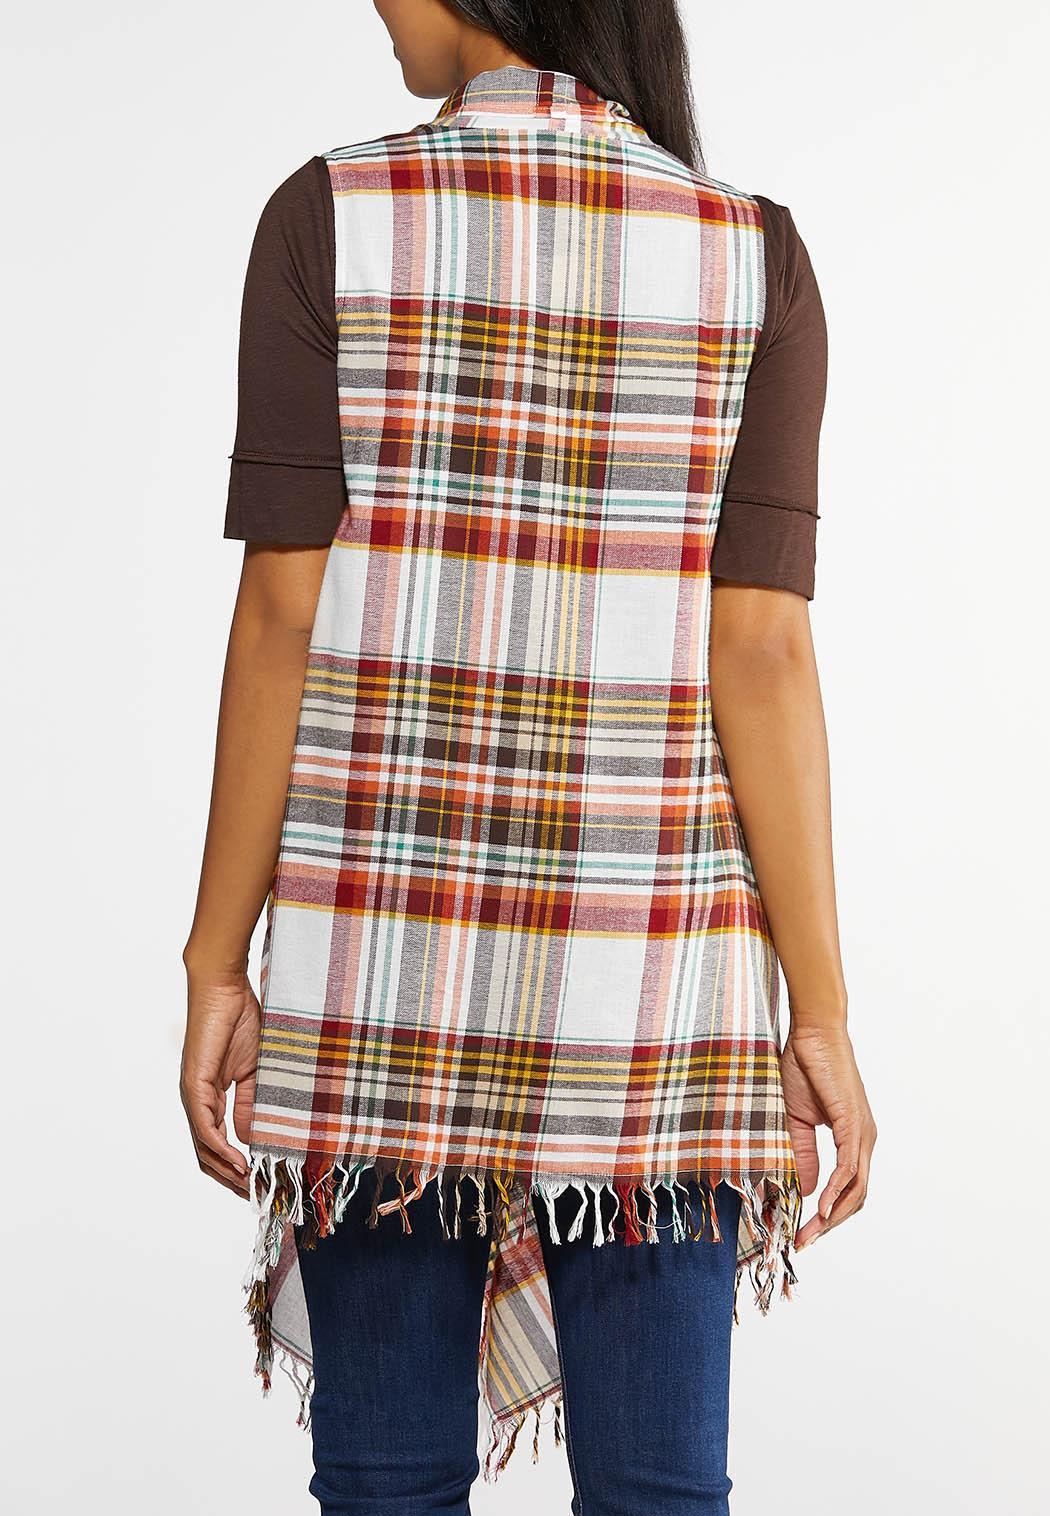 Plaid Fringe Vest (Item #43927437)